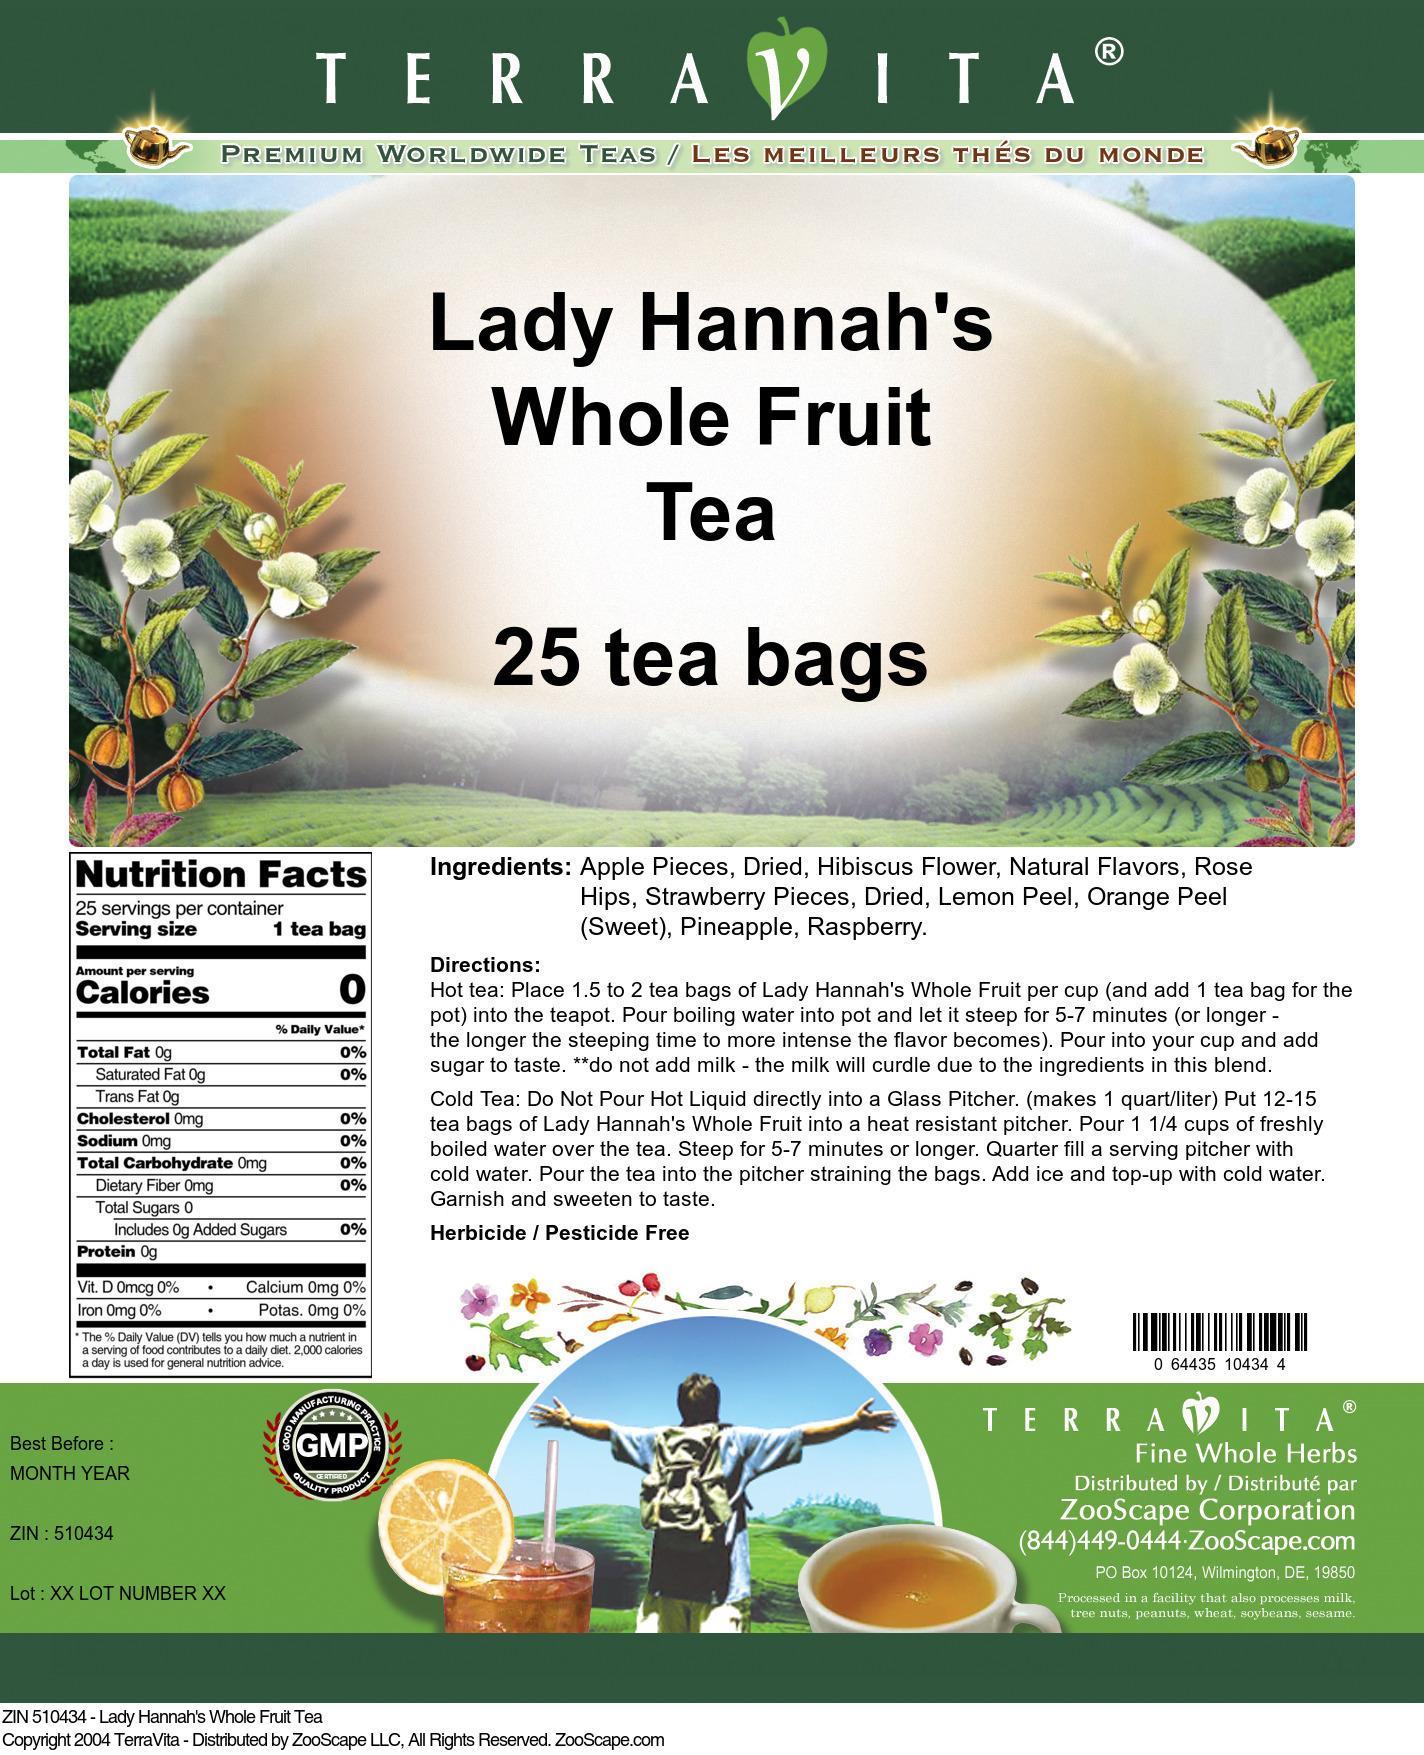 Lady Hannah's Whole Fruit Tea